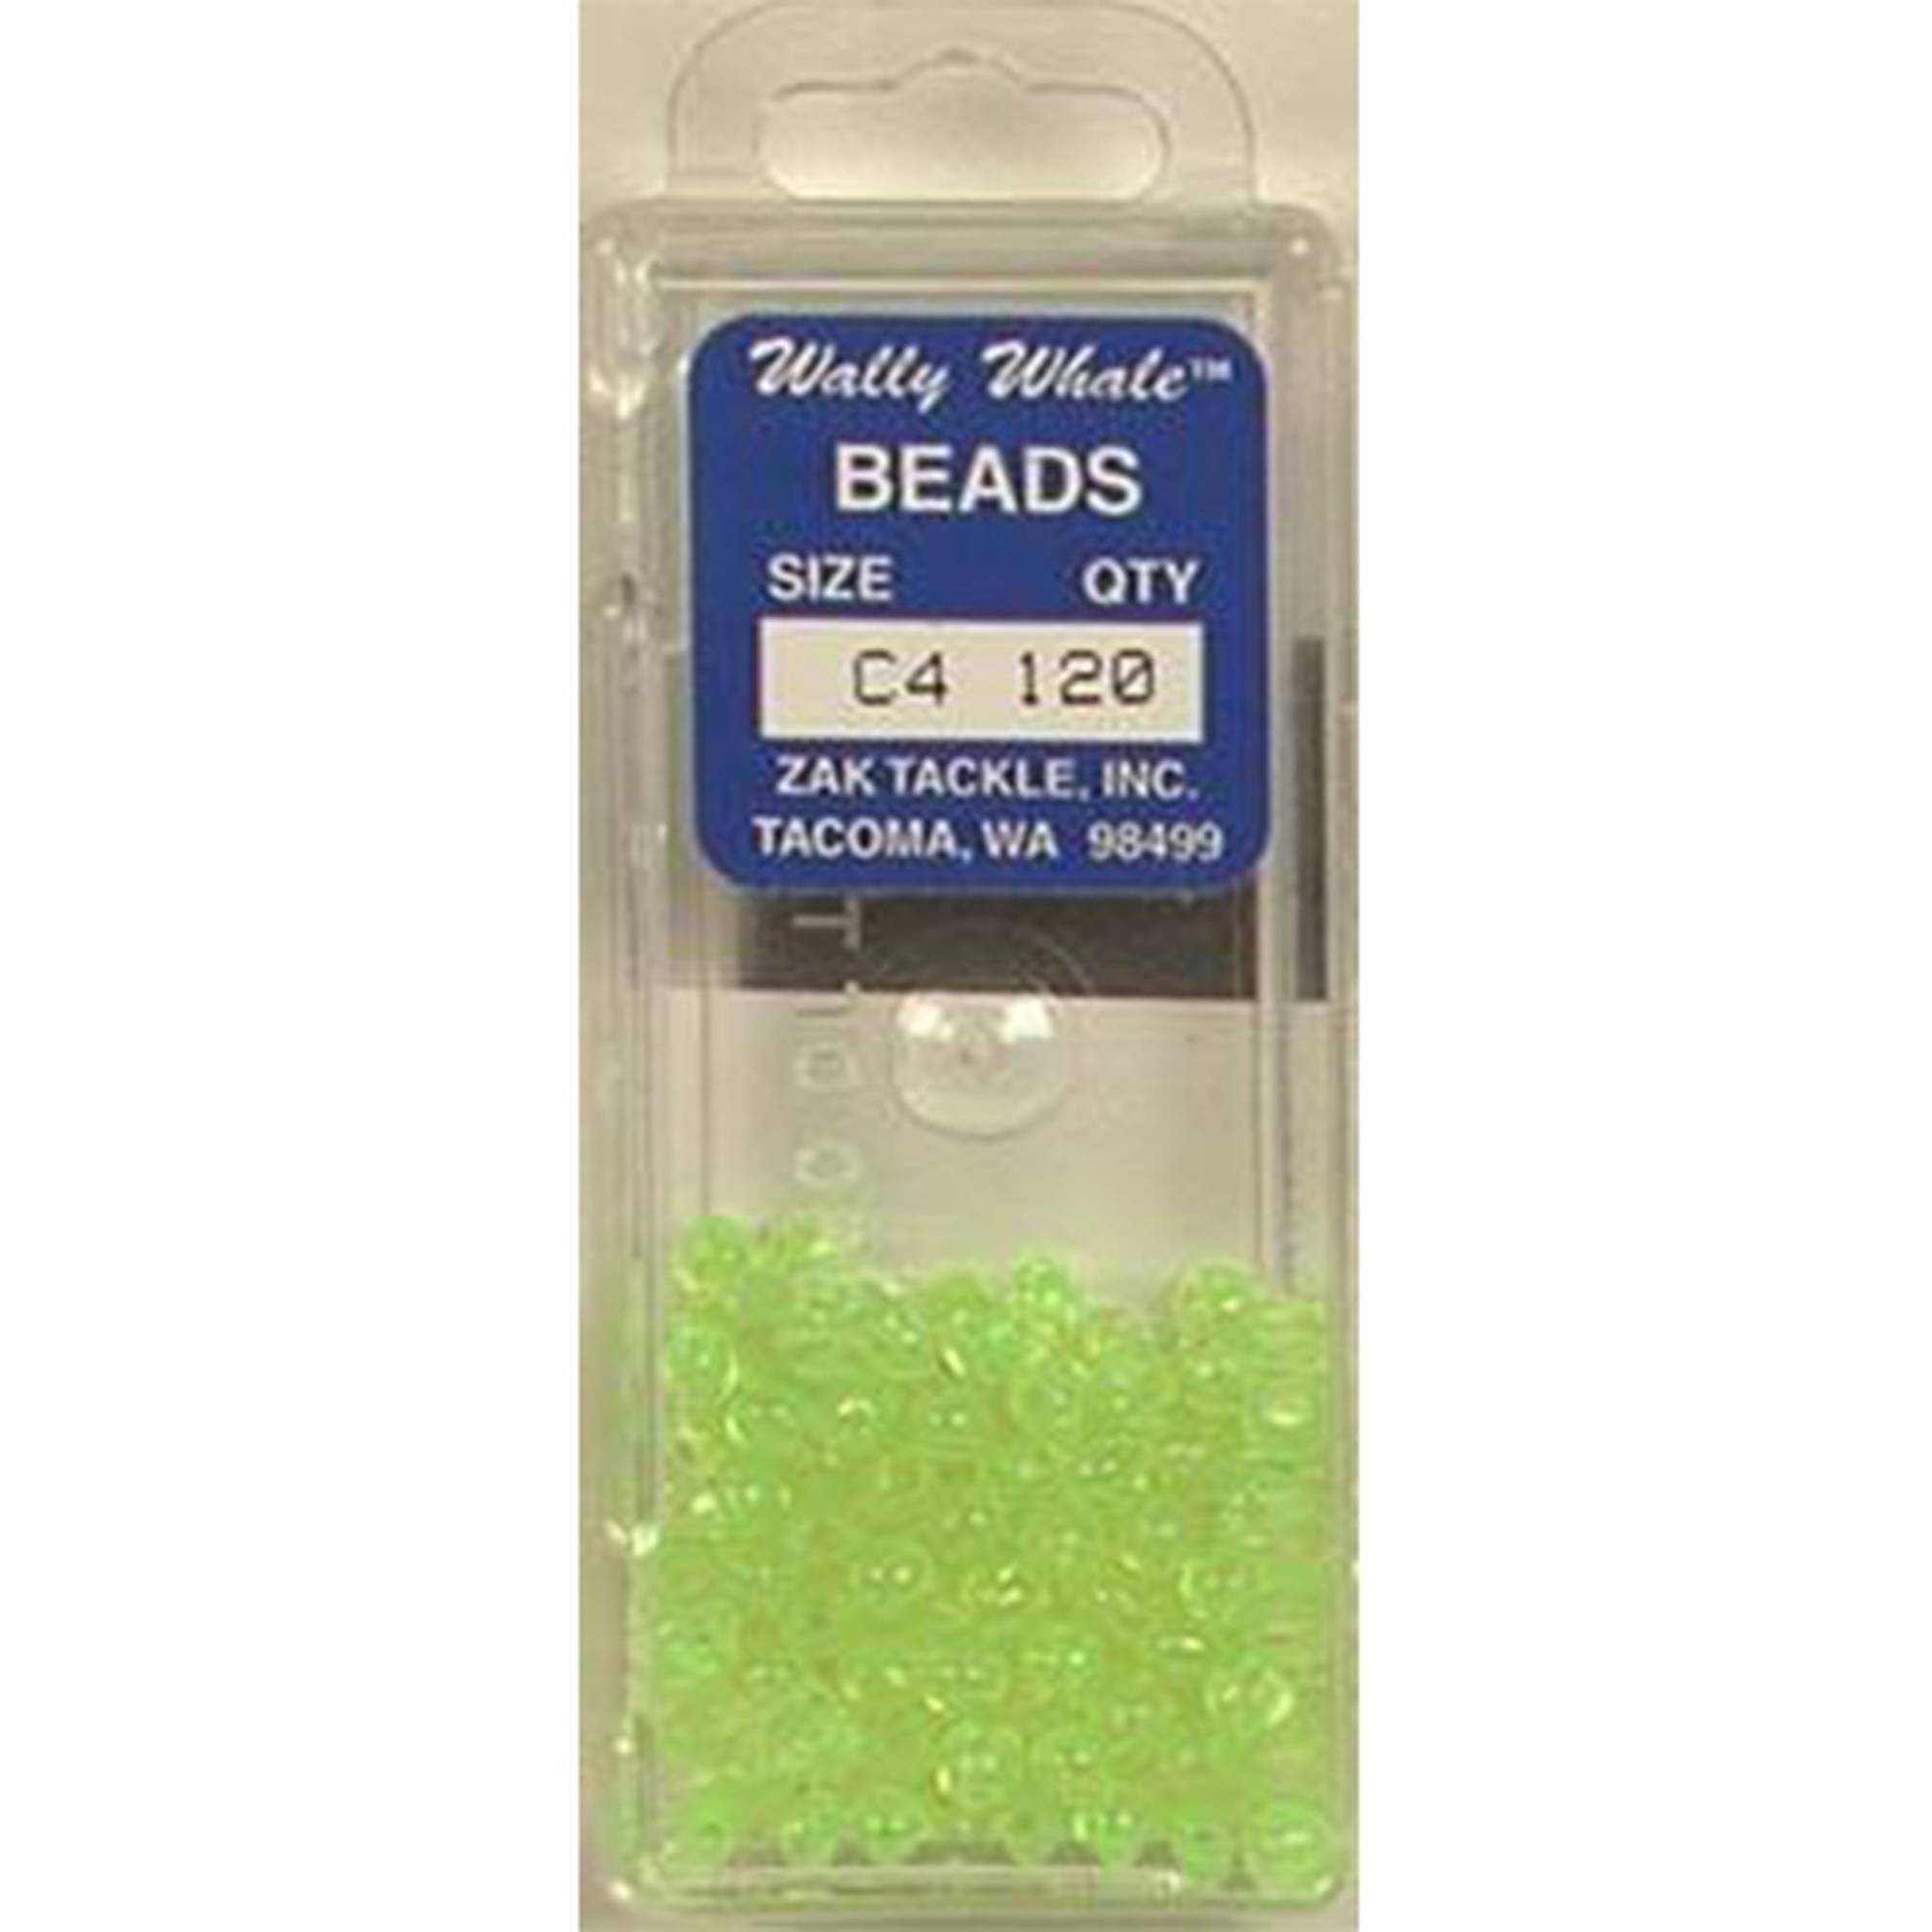 Zak Tackle Chart Beads SZ4 Box of 120 by Gibbs